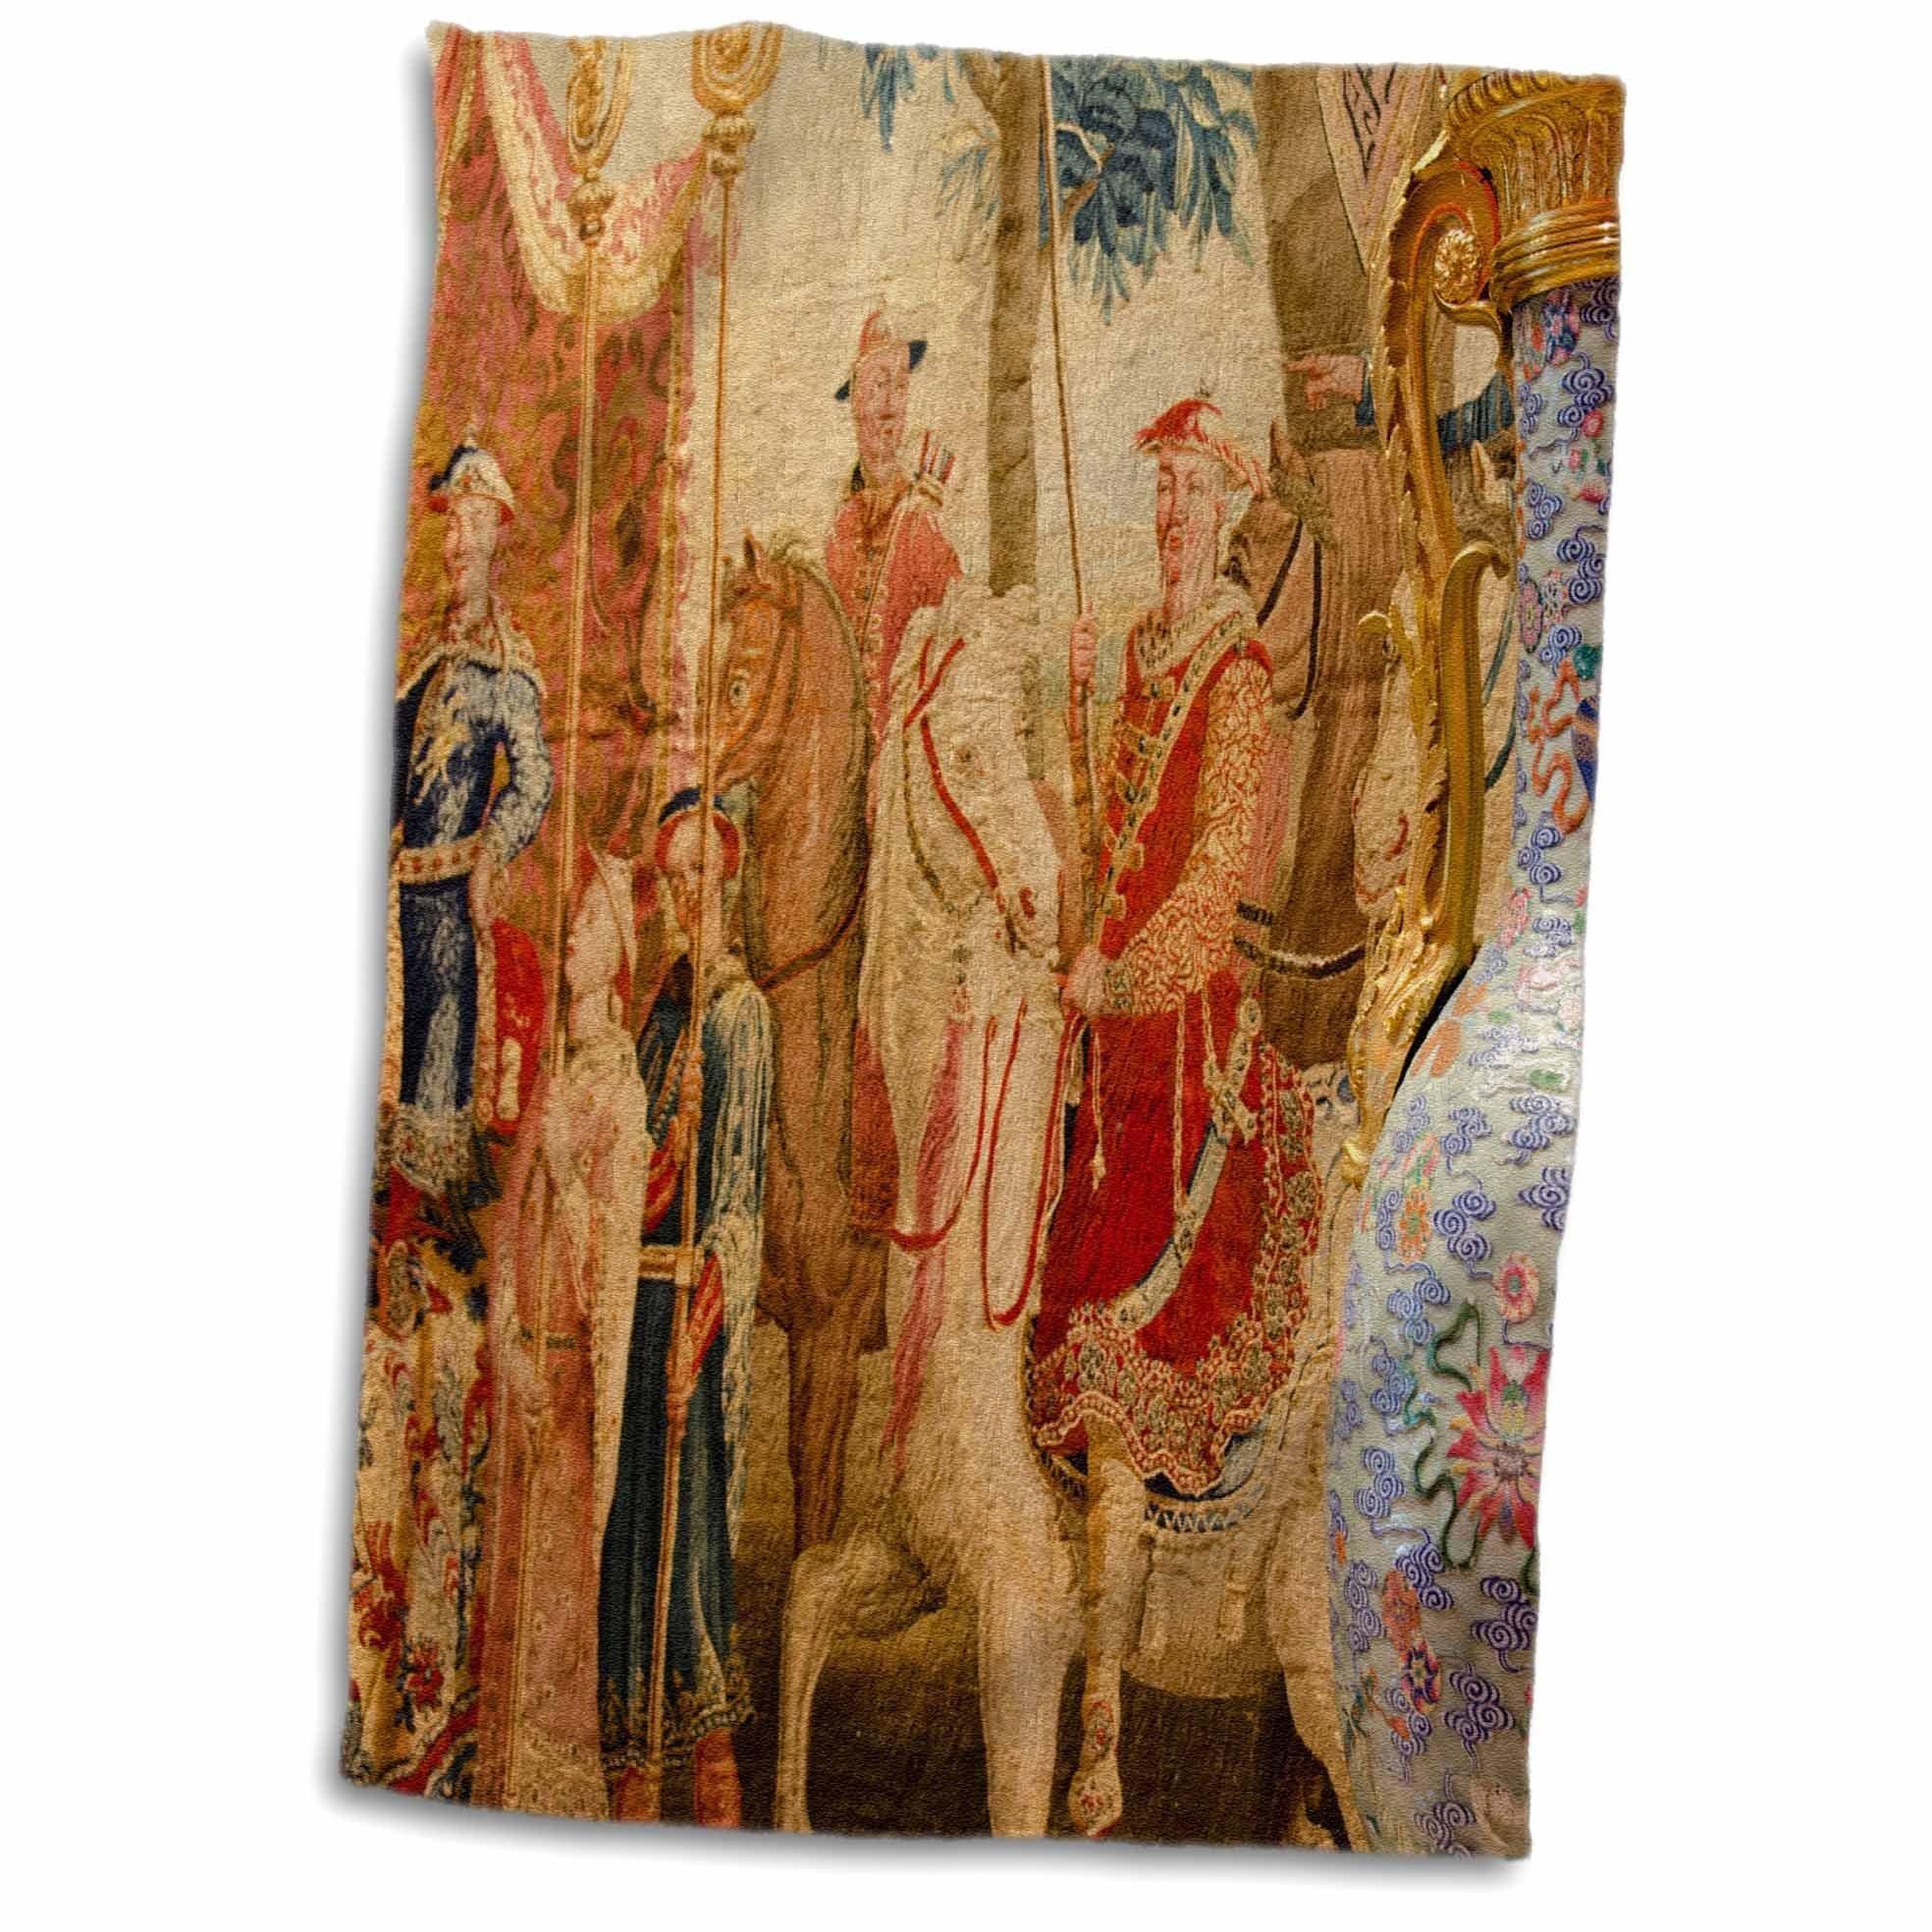 3D Rose acau. Wynn Hotel and Casino. Chinoiserie Tapestry. TWL_187621_1 Towel, 15'' x 22''